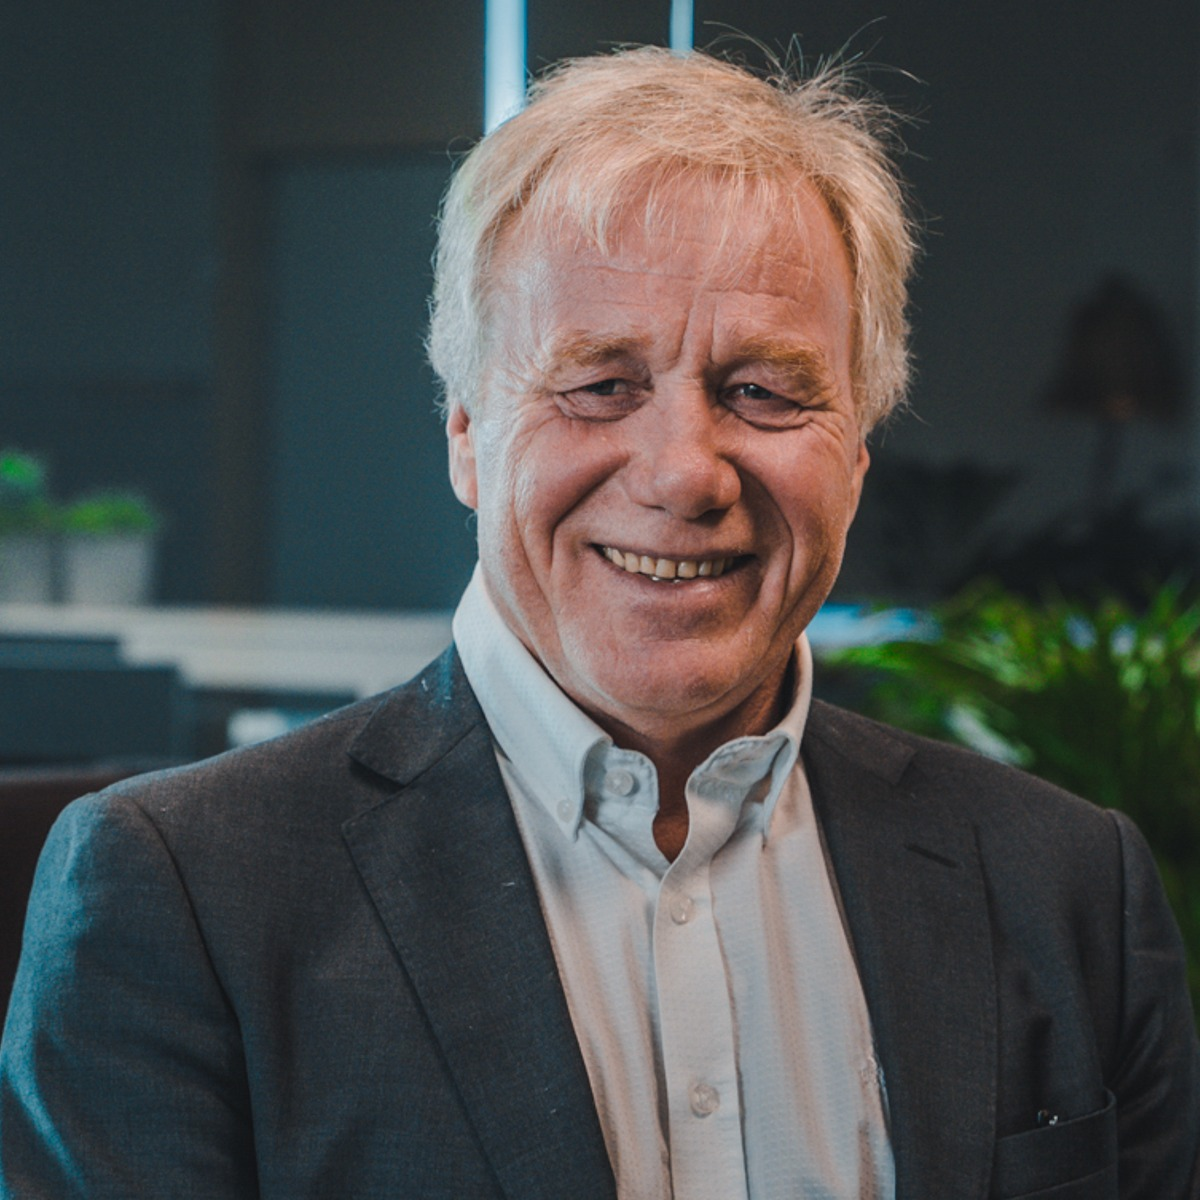 Alf Inge Johansen